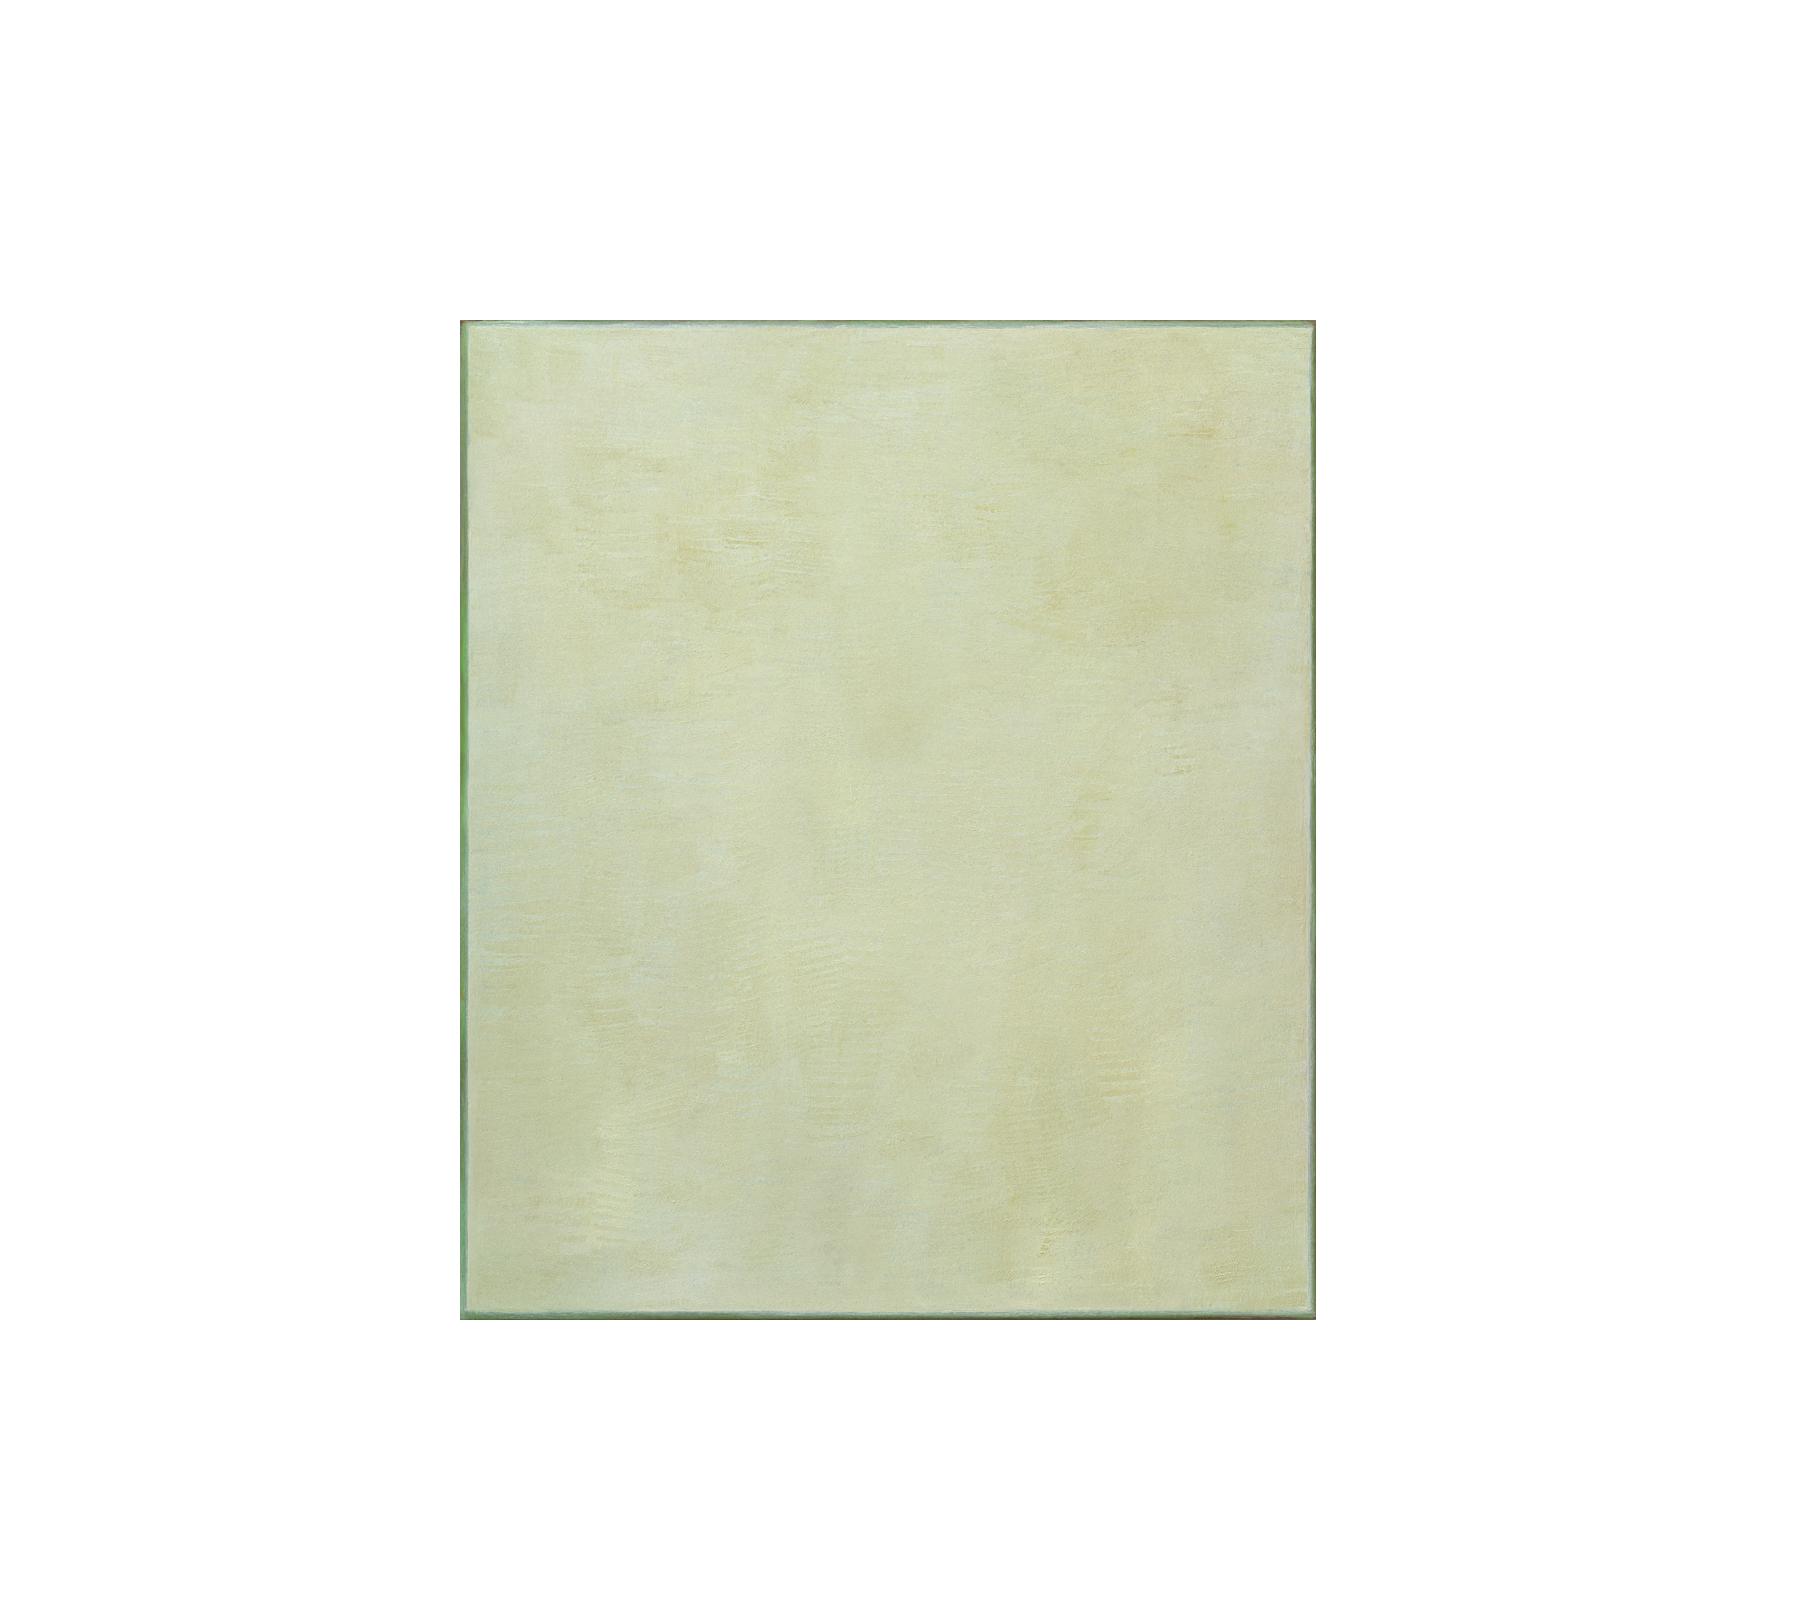 Untitled 2020 140x120cm